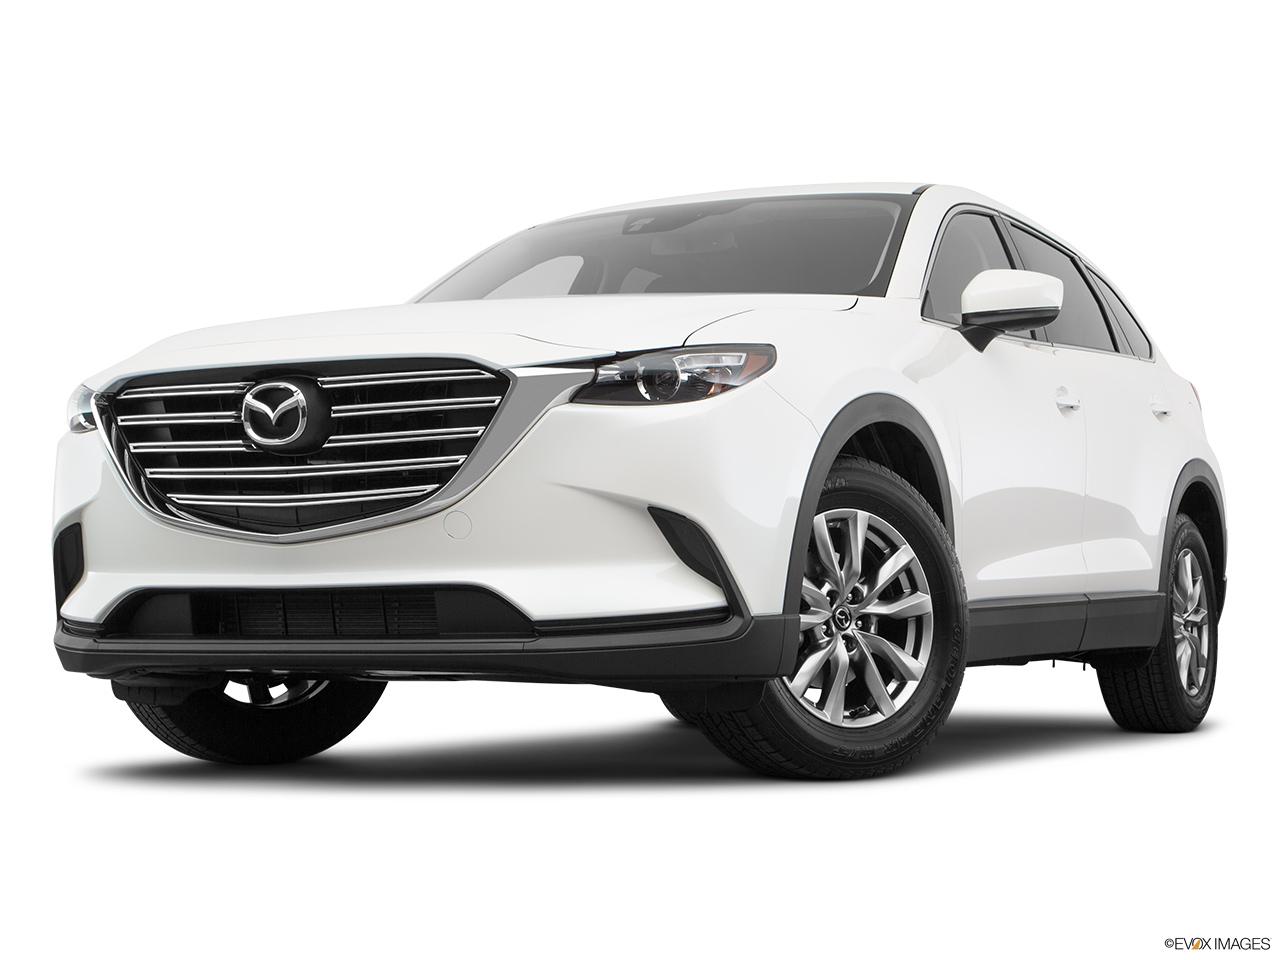 Mazda CX-9 2018, Saudi Arabia, Front angle view, low wide perspective.